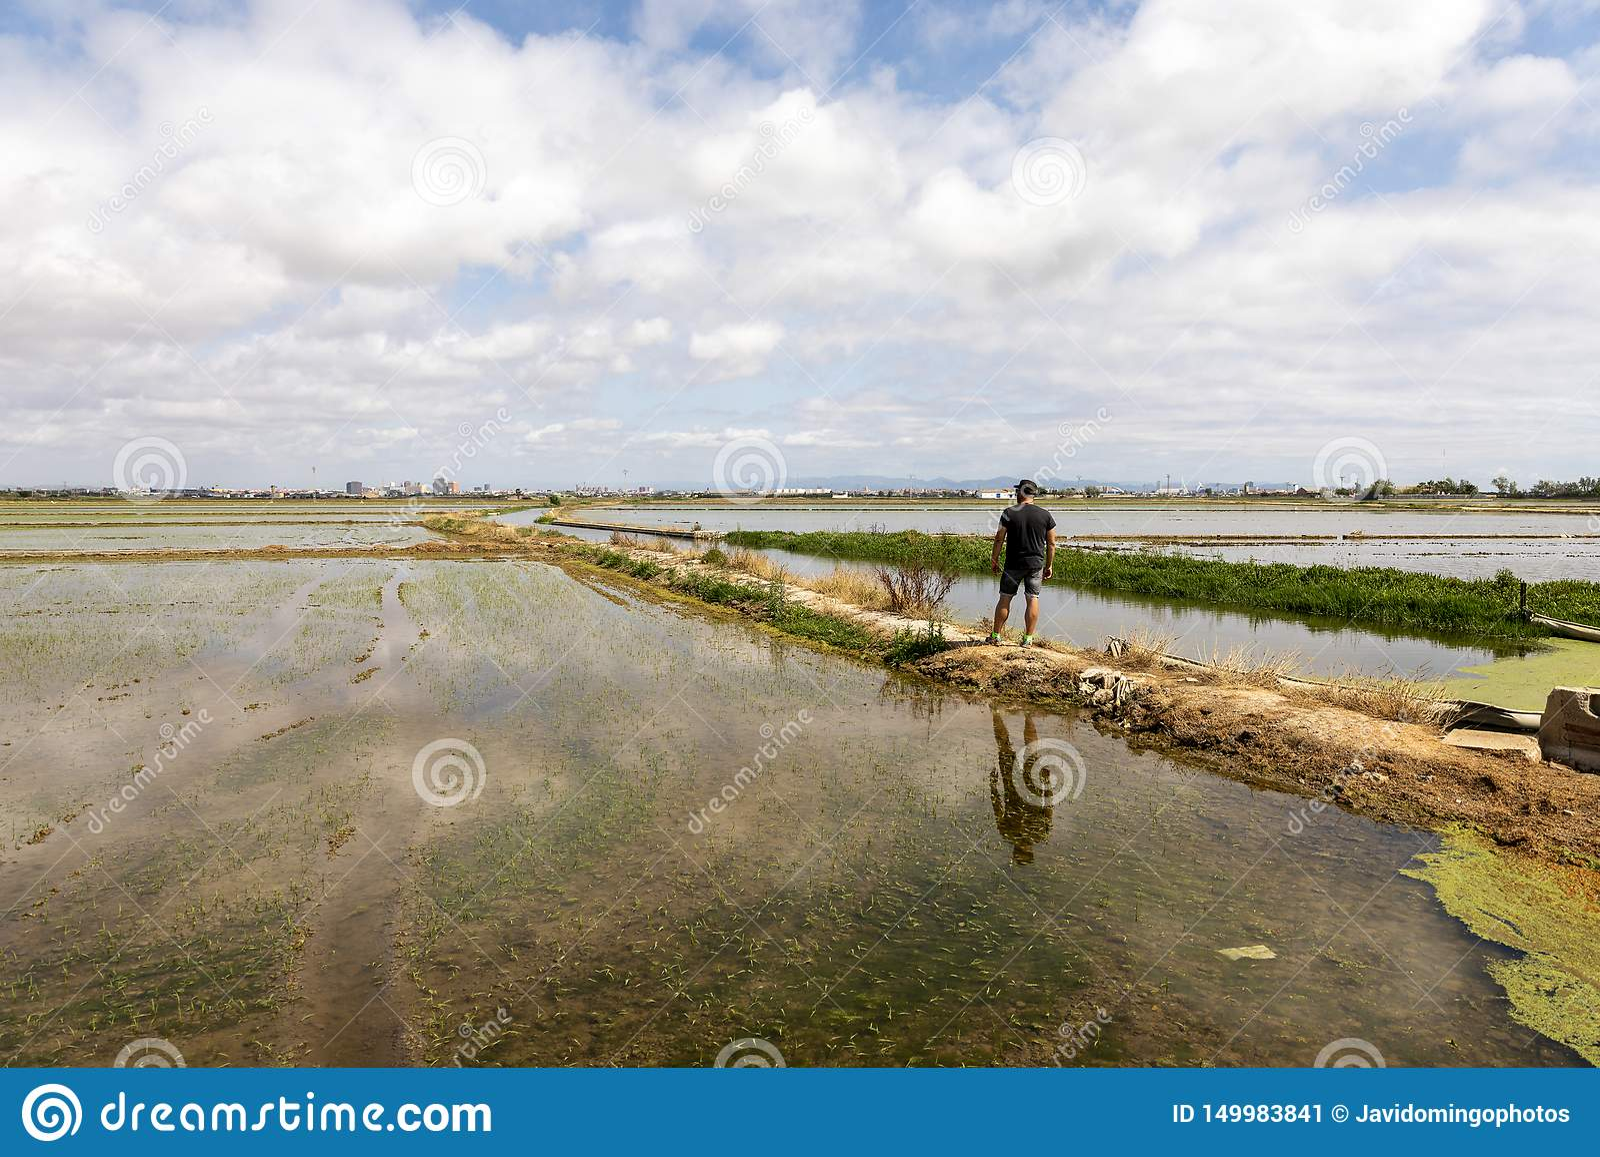 Man observing the rice fields near Valencia